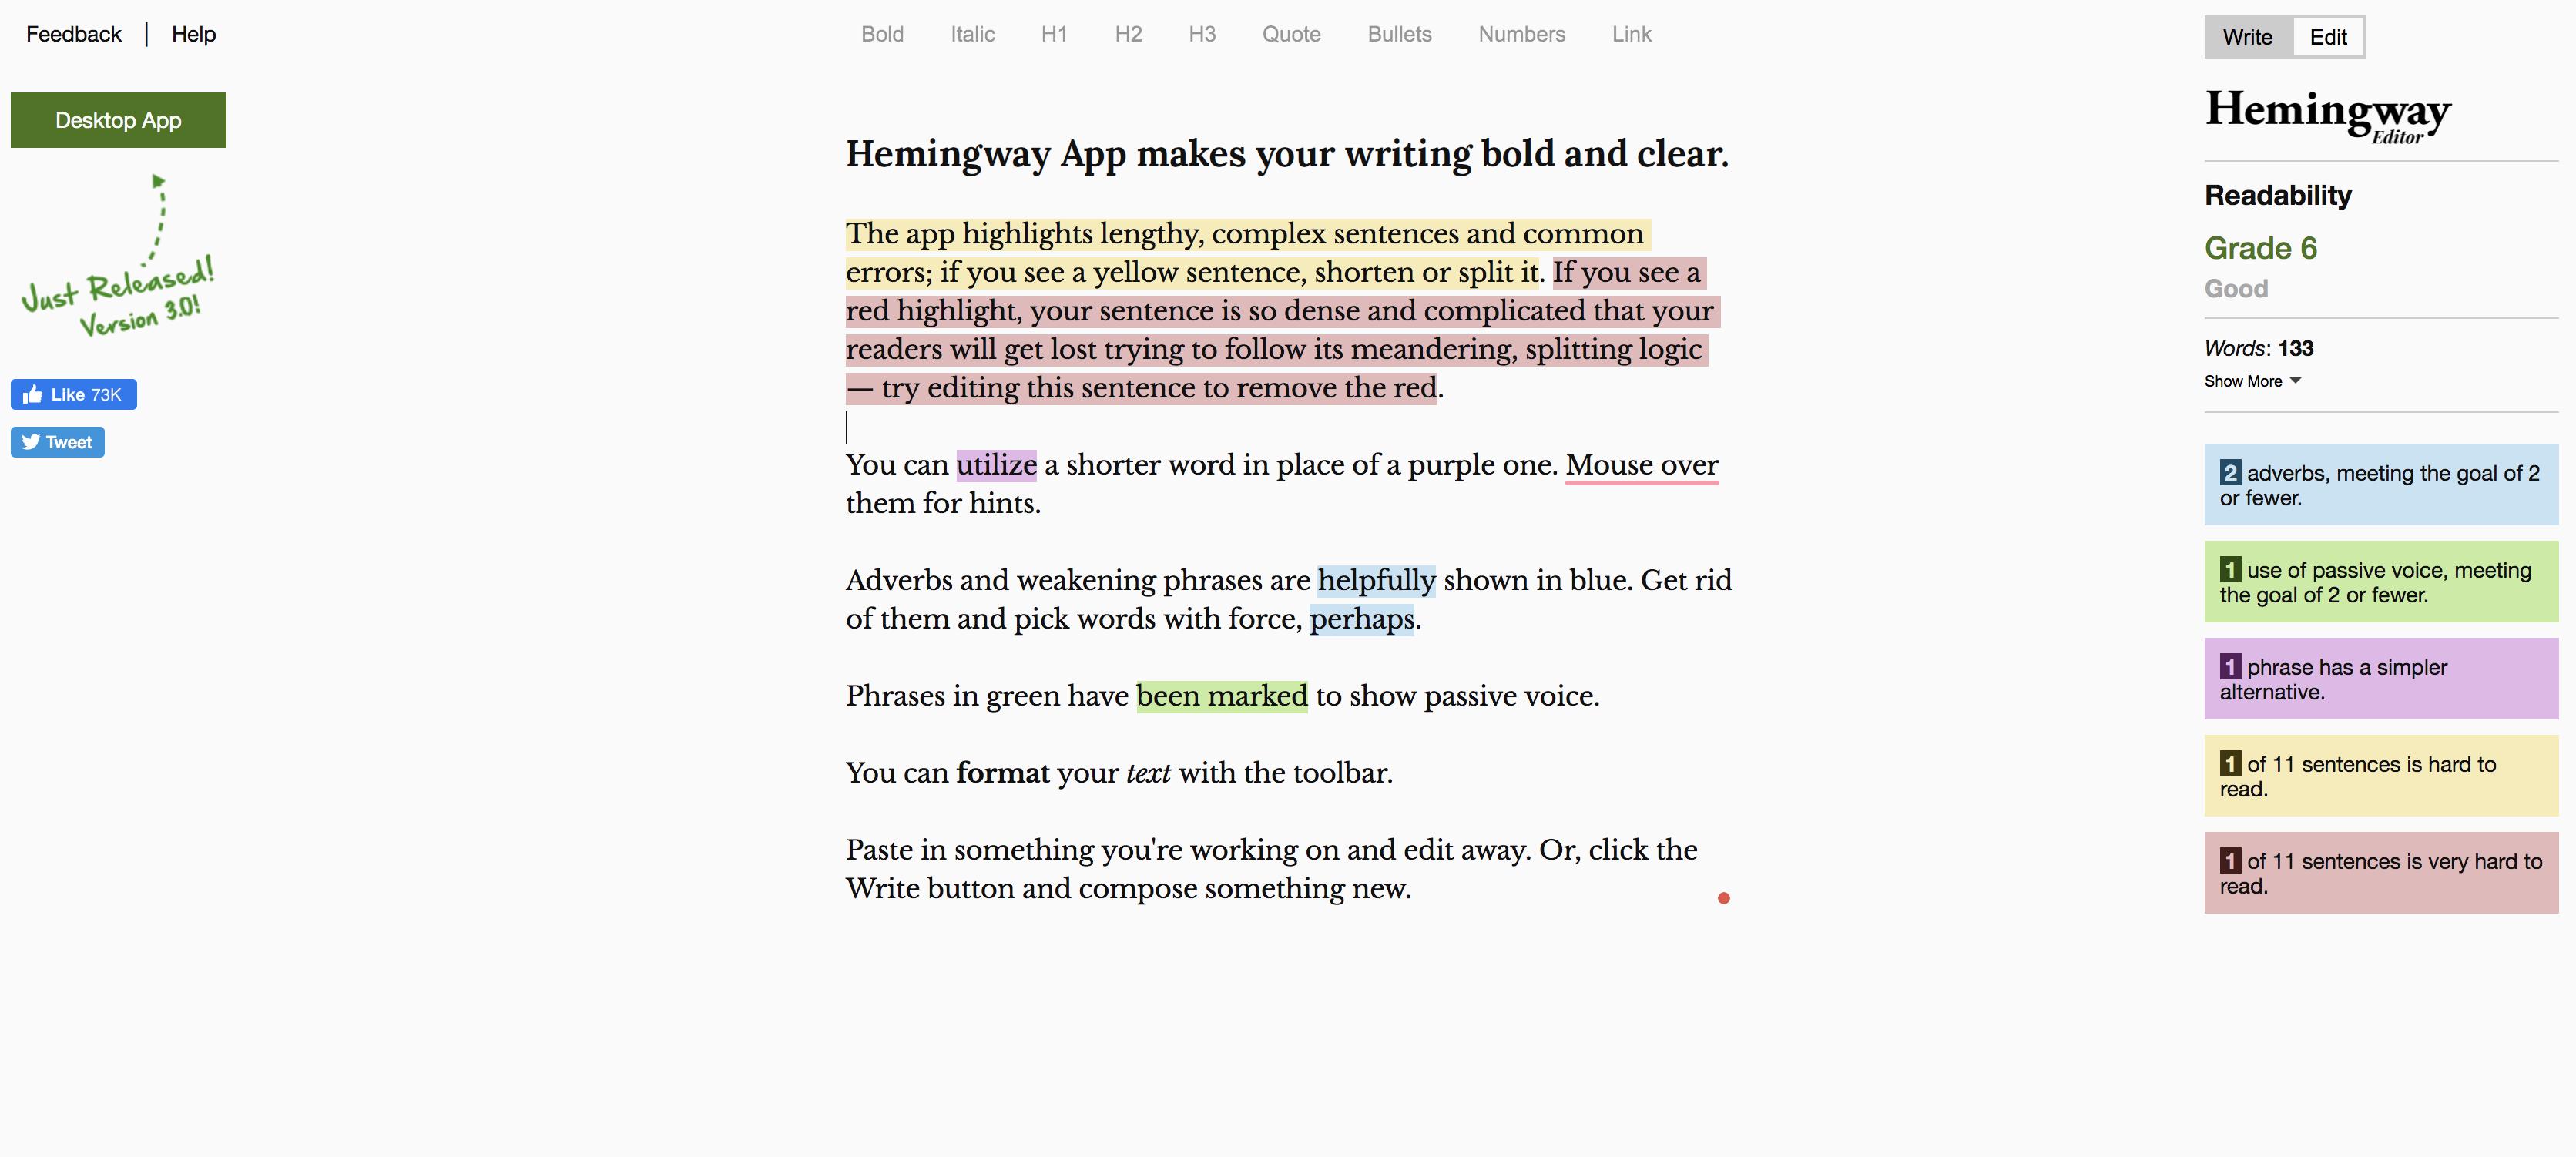 Hemingway app example